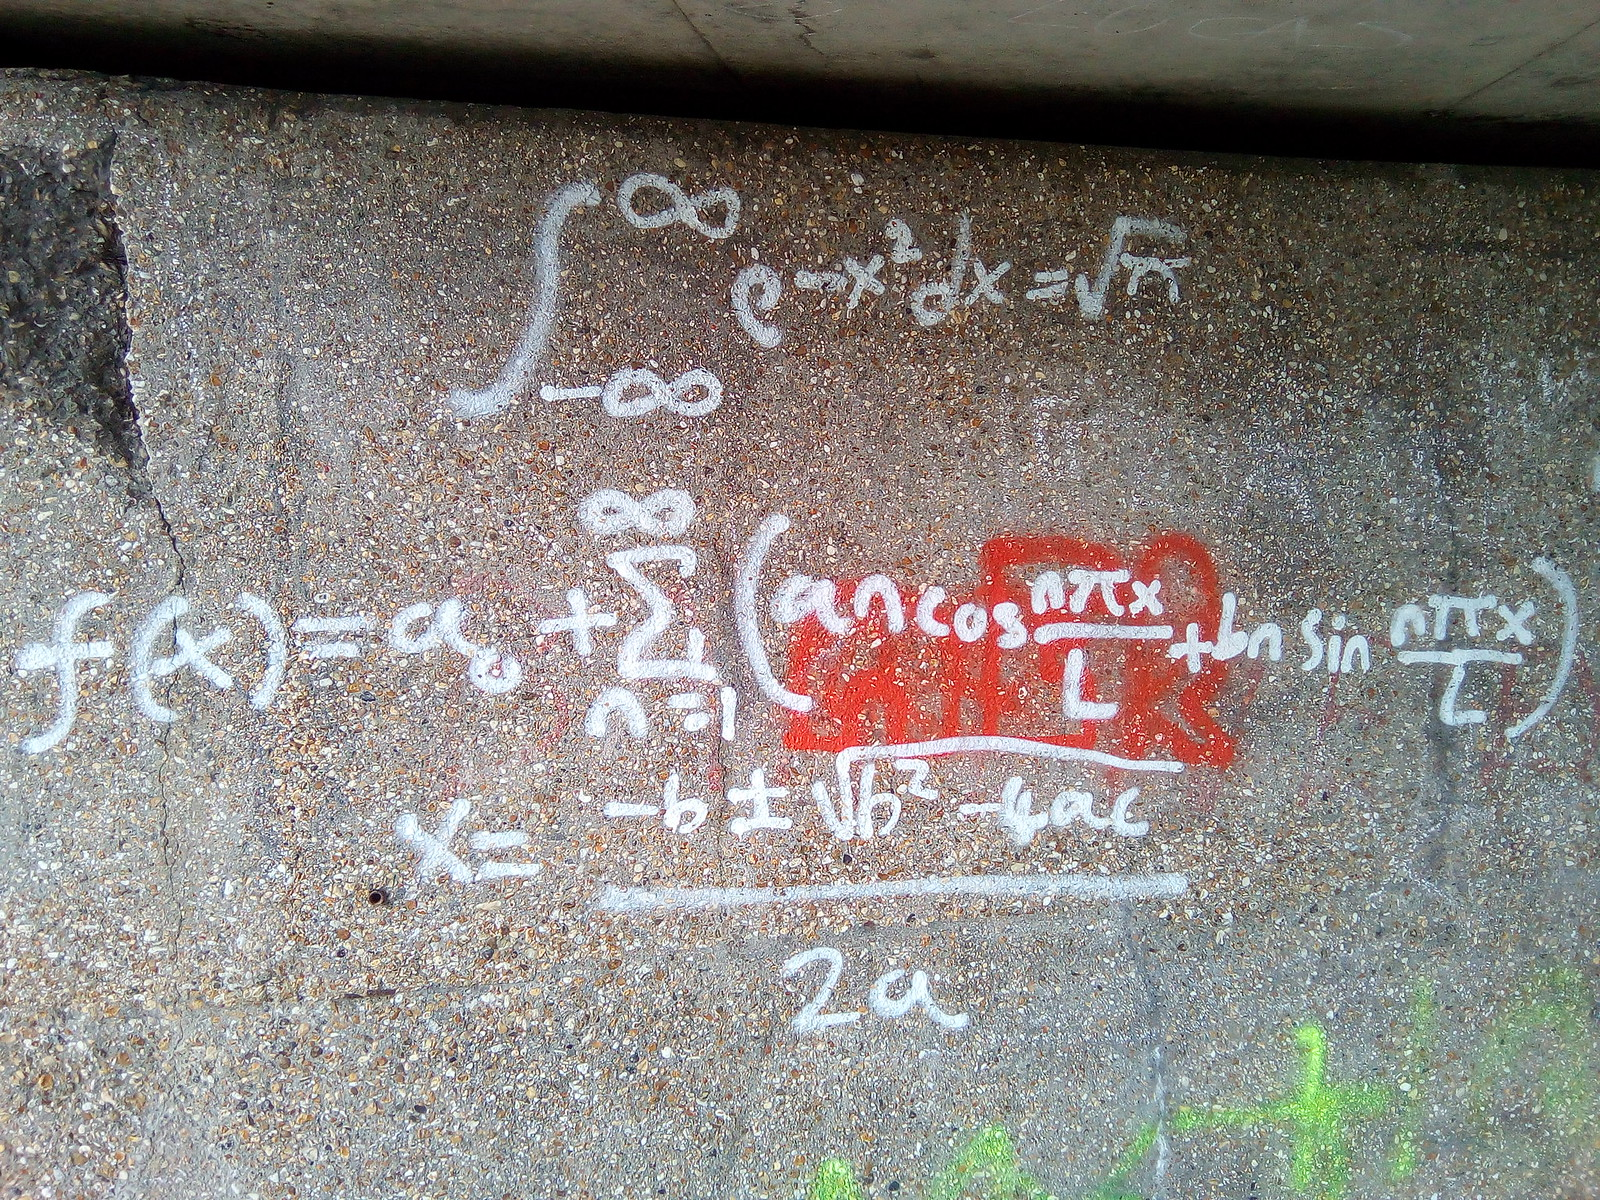 Maths Graffiti No e^-iπ = -1 though!